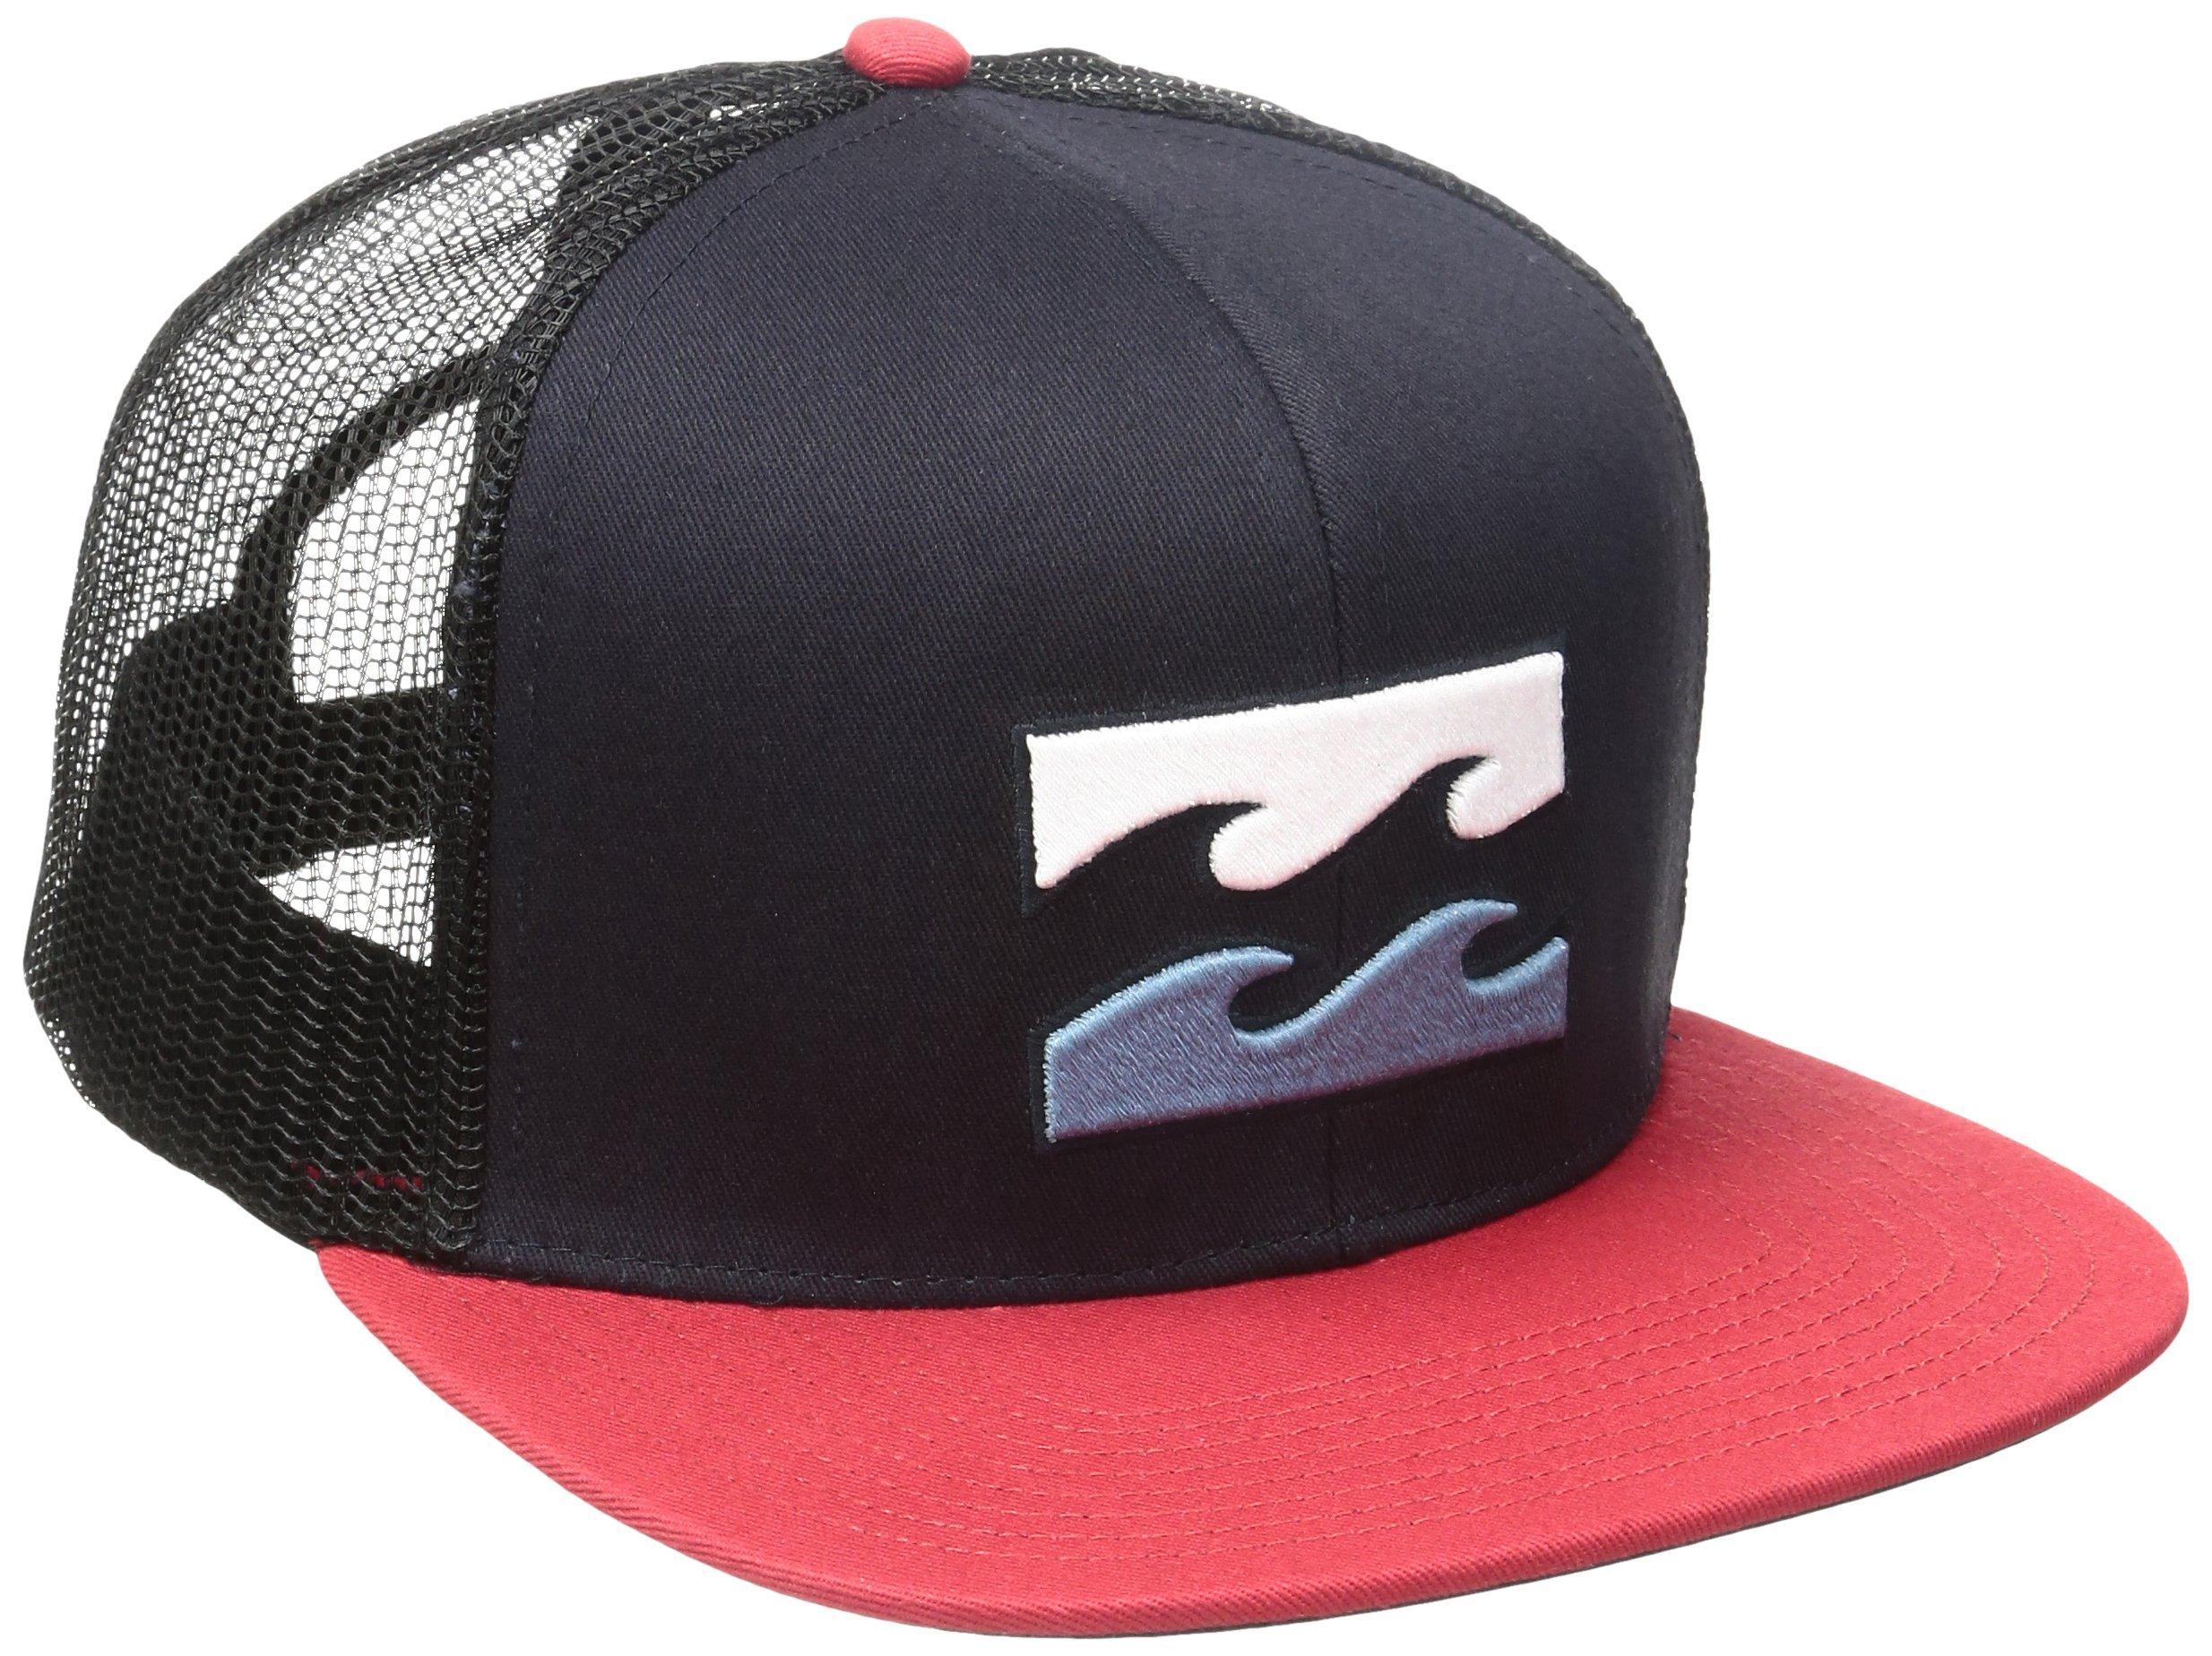 1c520835d3222 Galleon - Billabong Men s All Day Trucker Hat